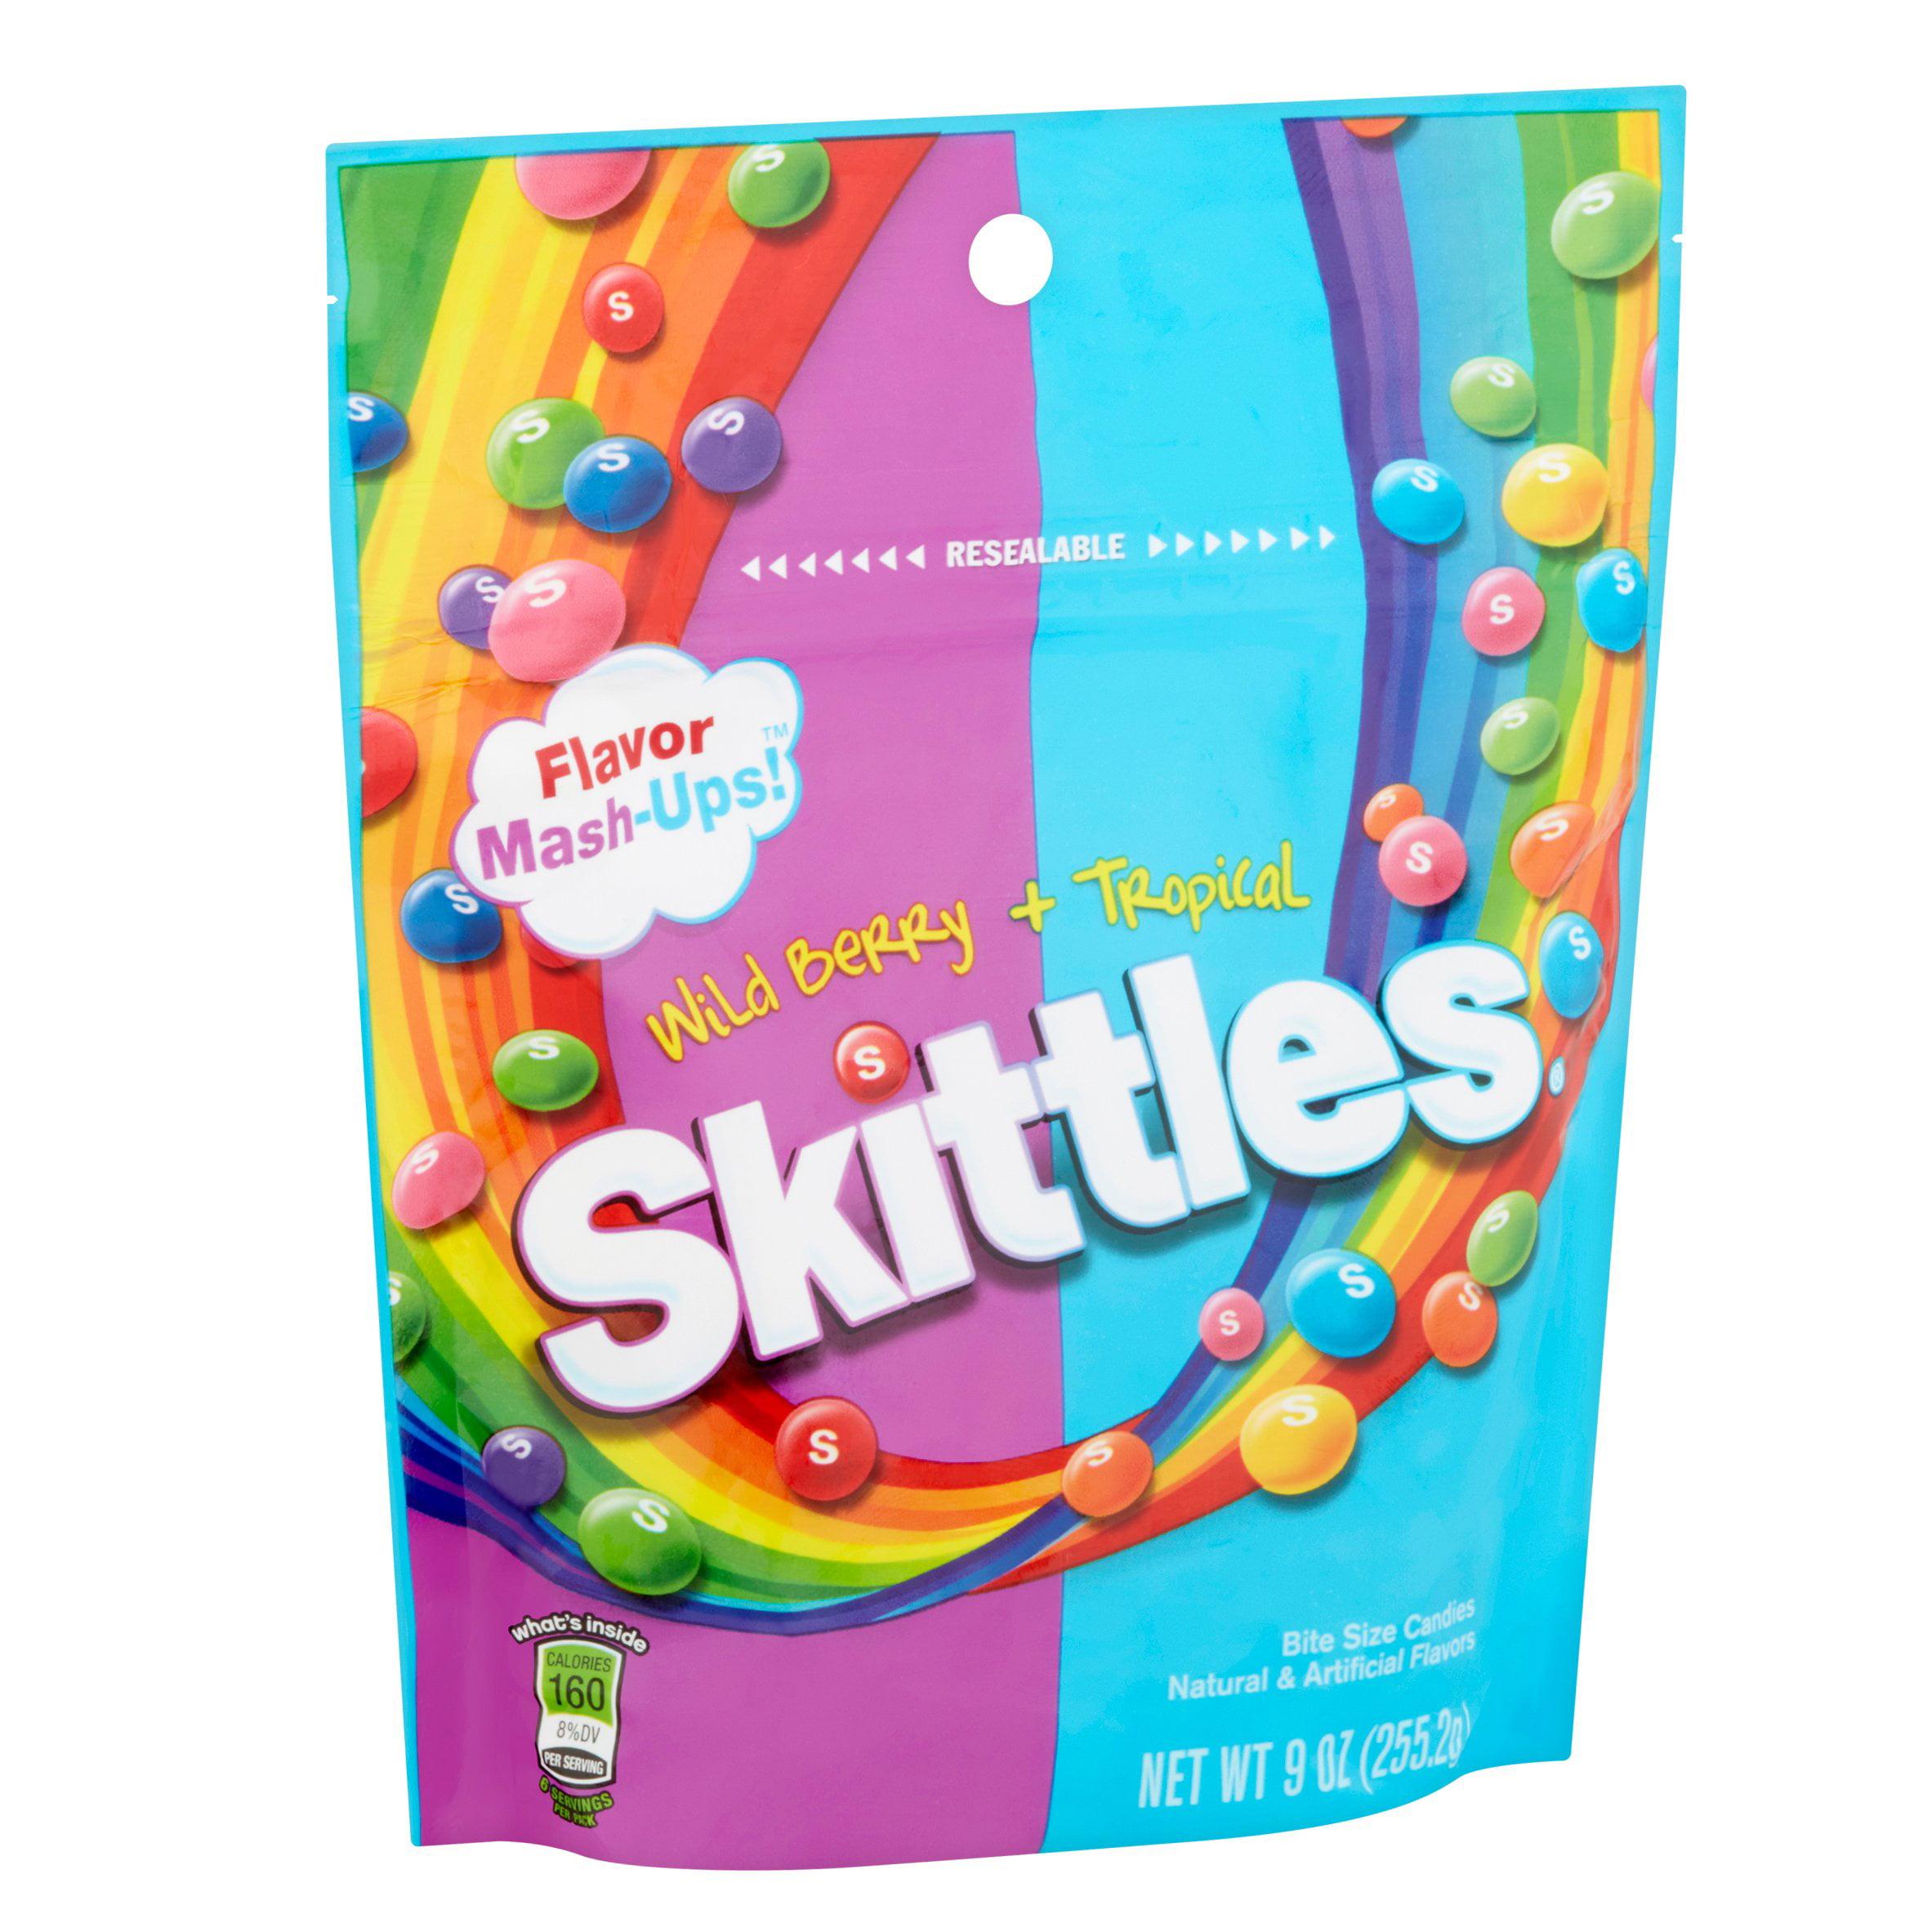 Skittles, Bite Size Flavor Mash-Ups! Wild Berry + Tropical Candies ...